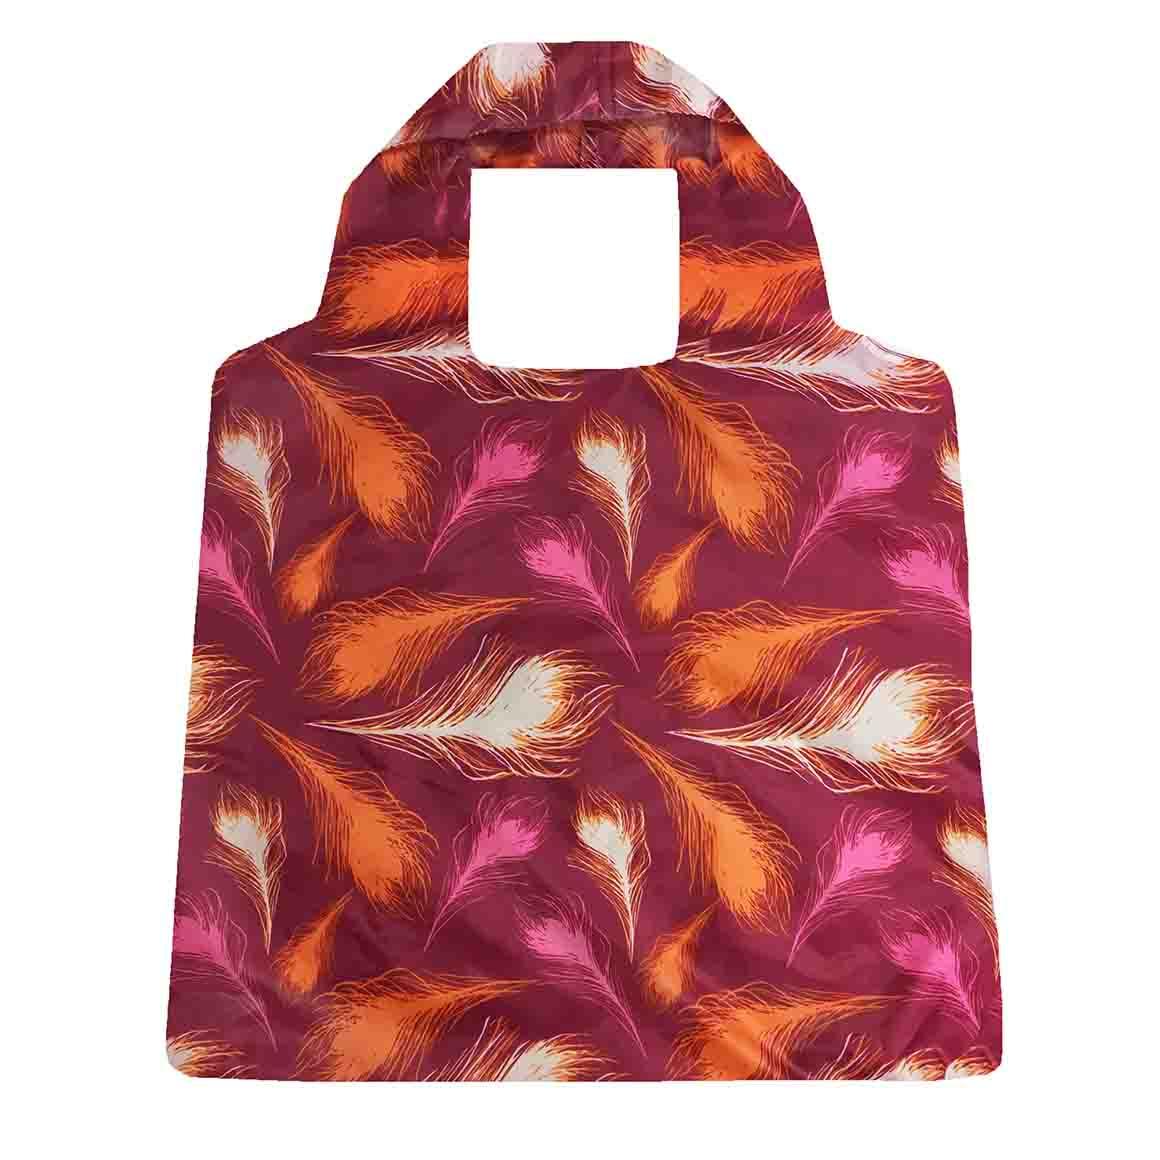 Feather Puff SAKitToMe Foldable Shopping Bag  | Trada Marketplace